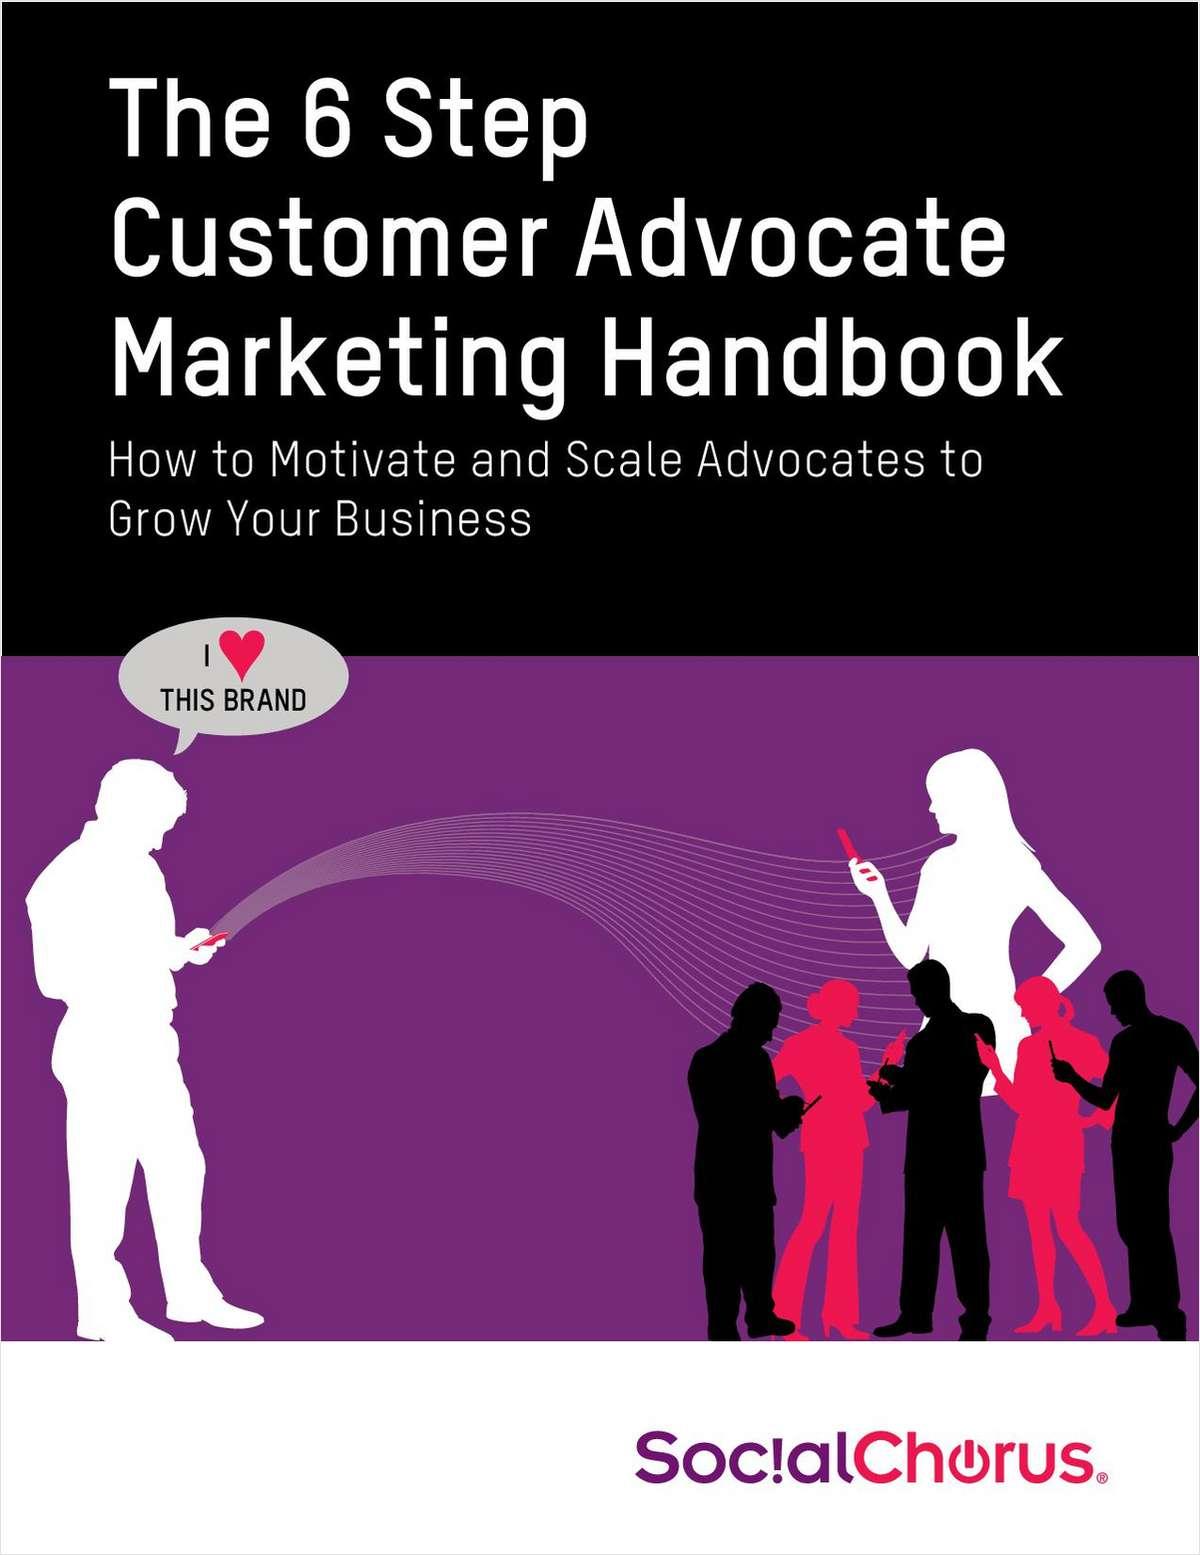 The 6 Step Customer Advocate Marketing Handbook